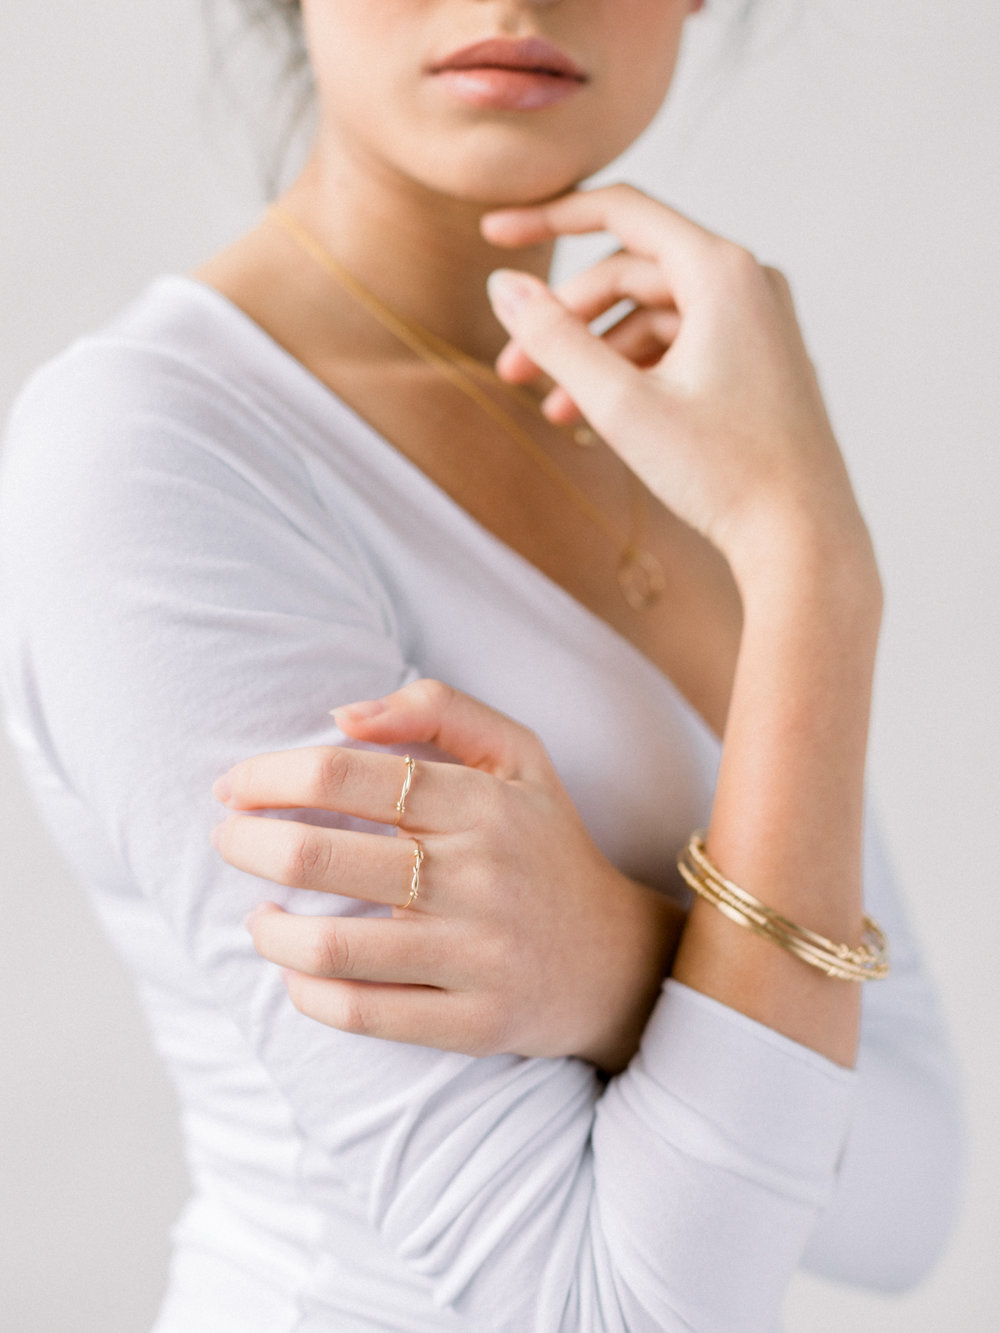 190217-0019-Rachelle-Celine-Handmade-Jewelry-DC-Elisenda-Llinares